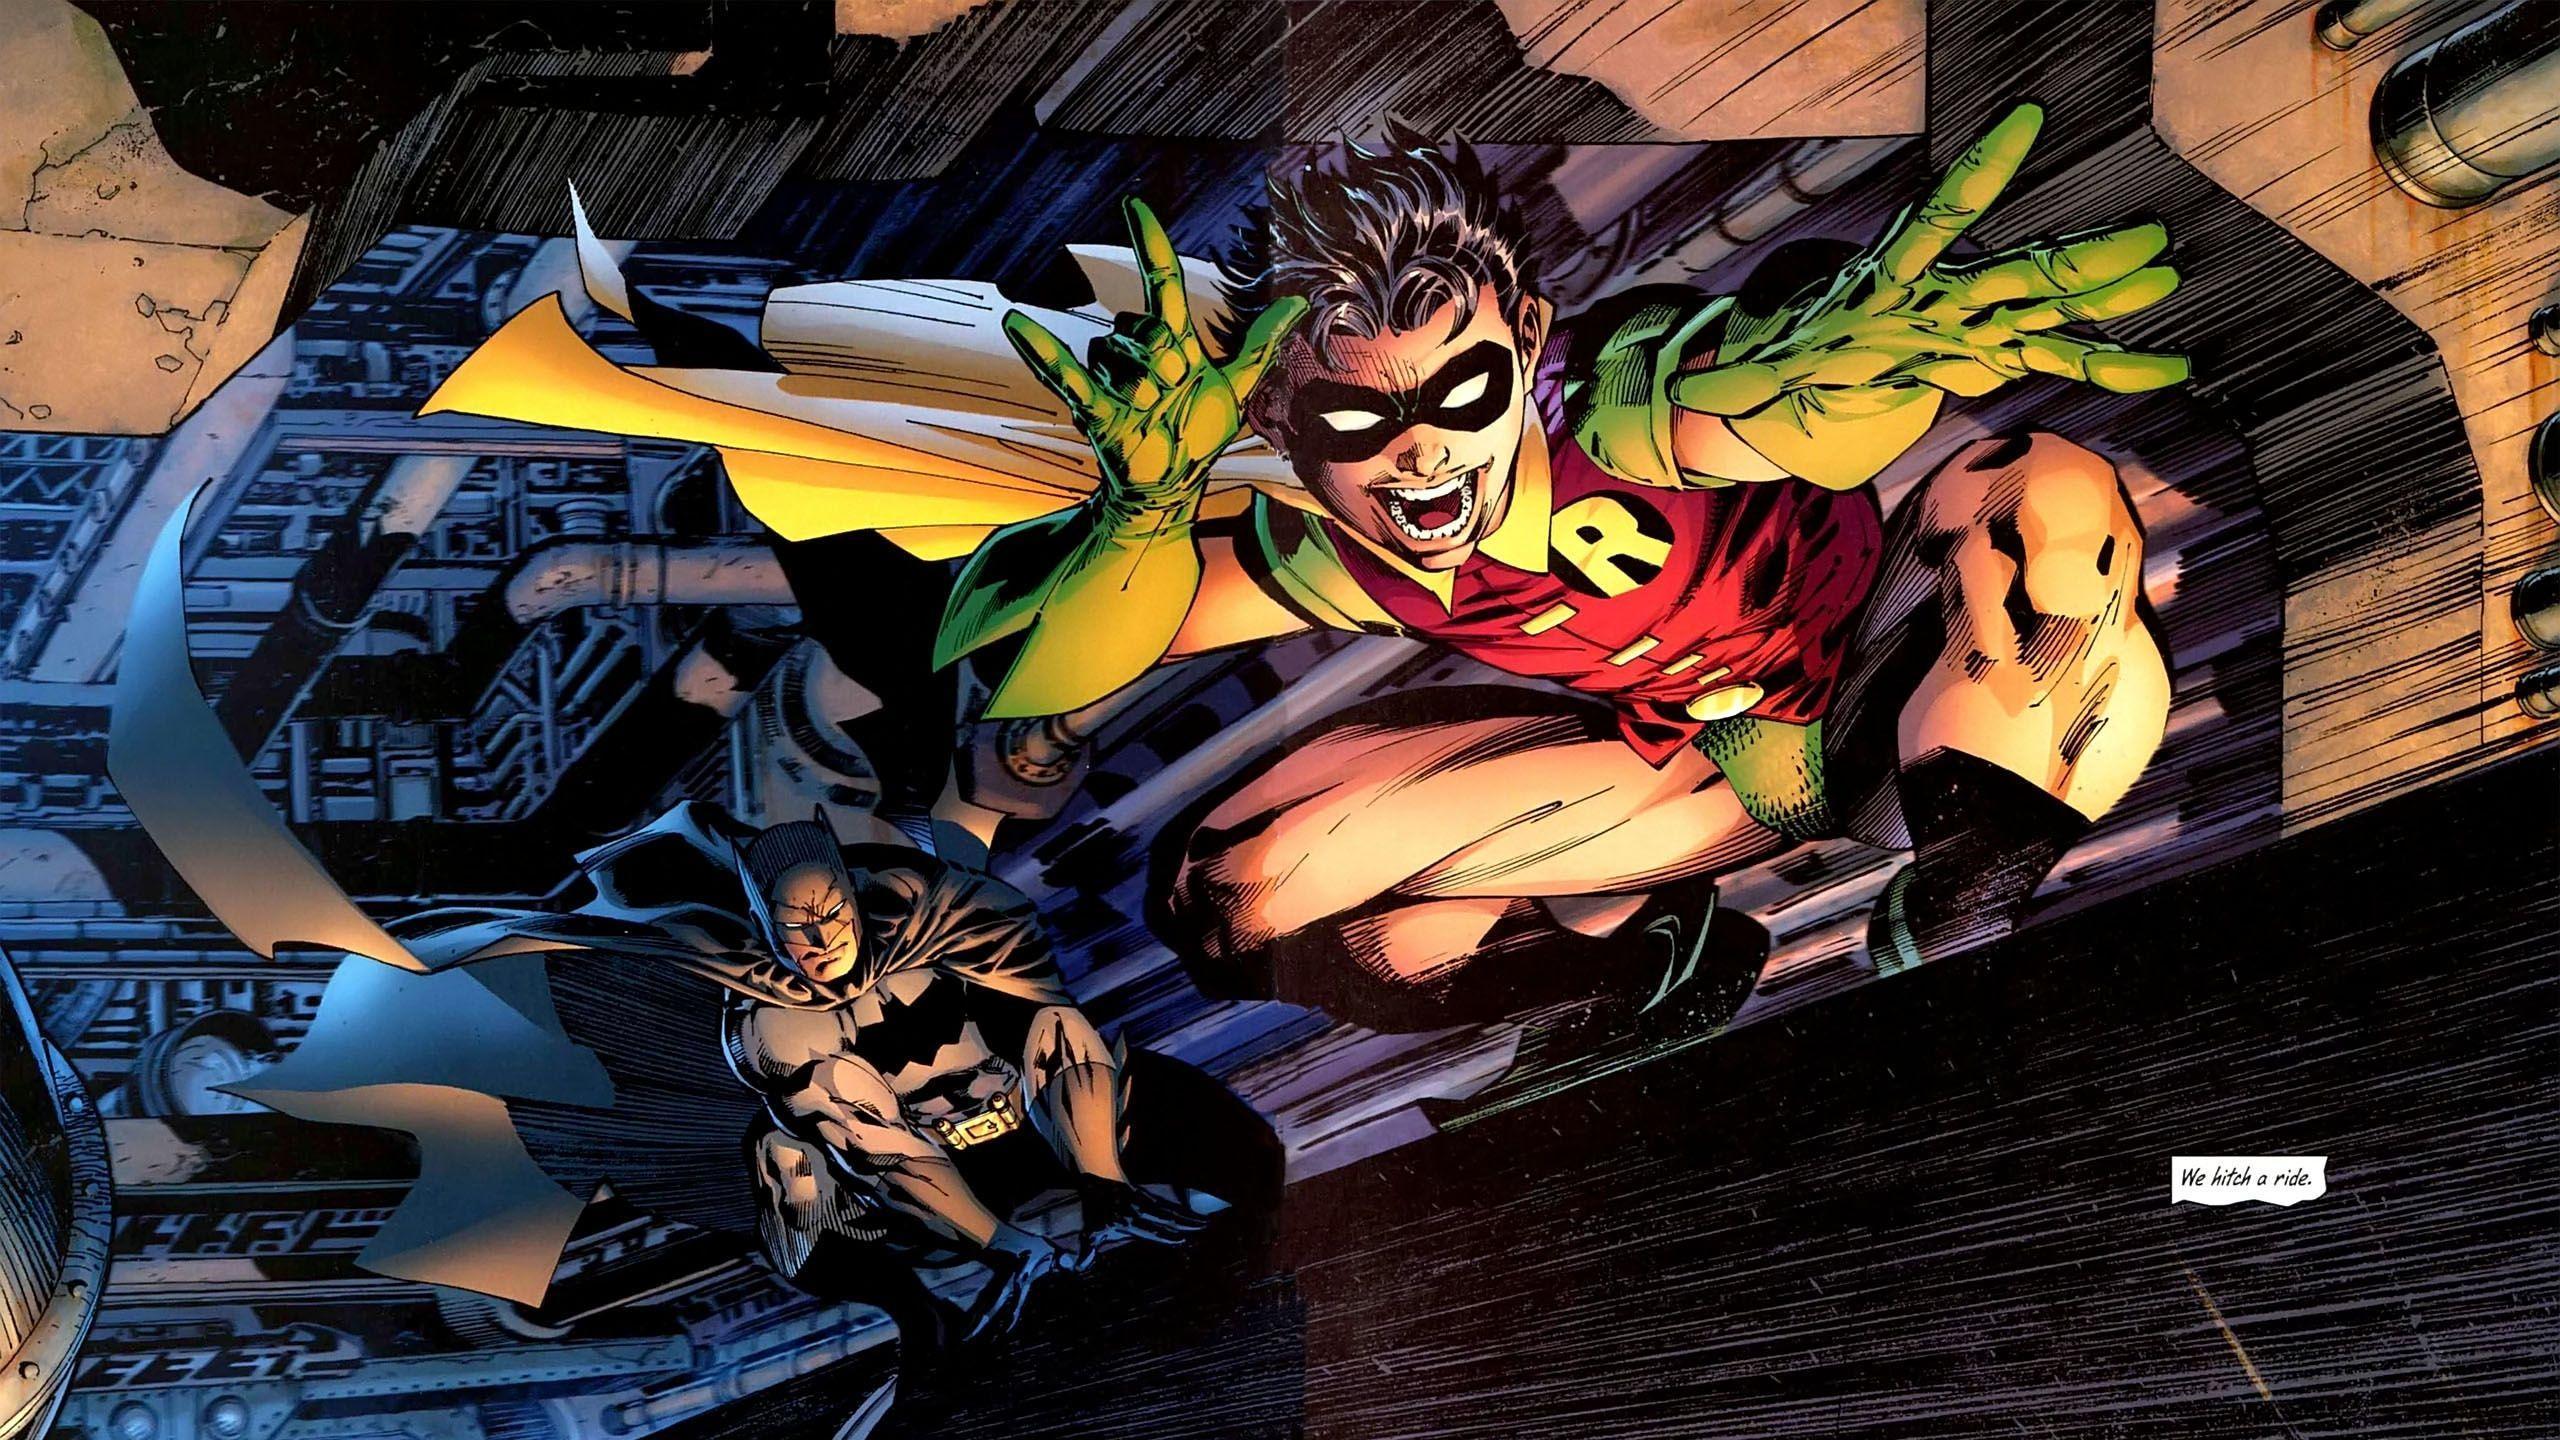 1 All-Star Batman & Robin HD Wallpapers | Backgrounds ...